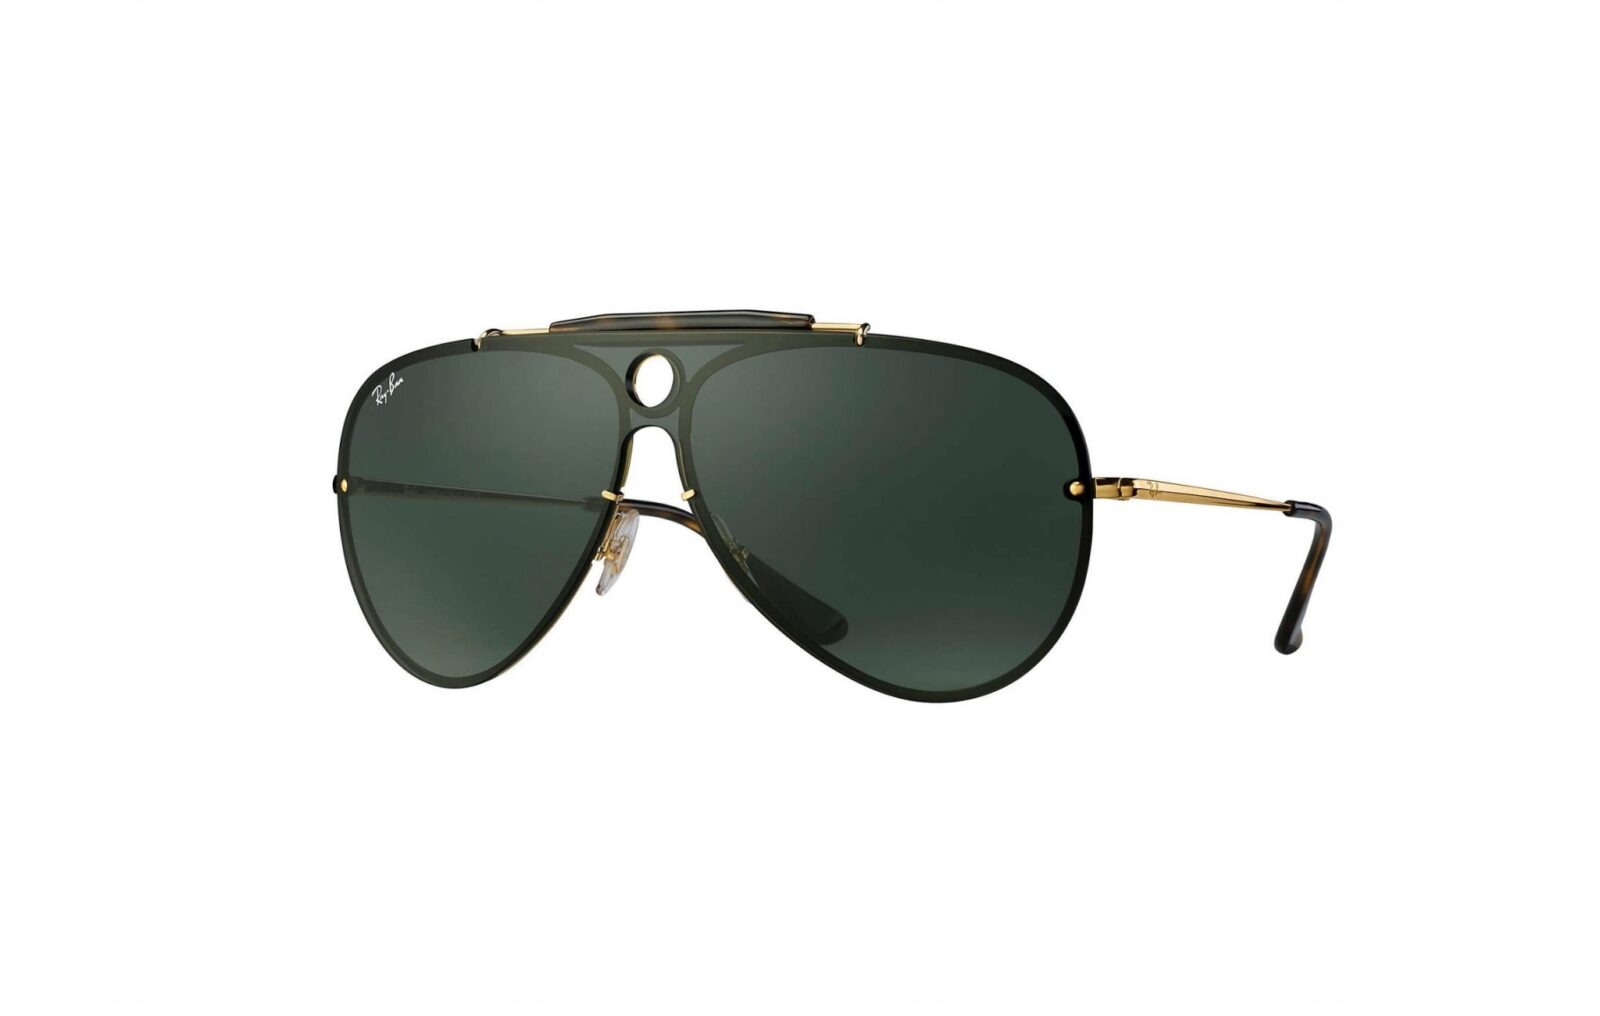 Ray Ban Blaze Shooter Sunglasses 1600x1016 - Ray-Ban Blaze Shooter Sunglasses